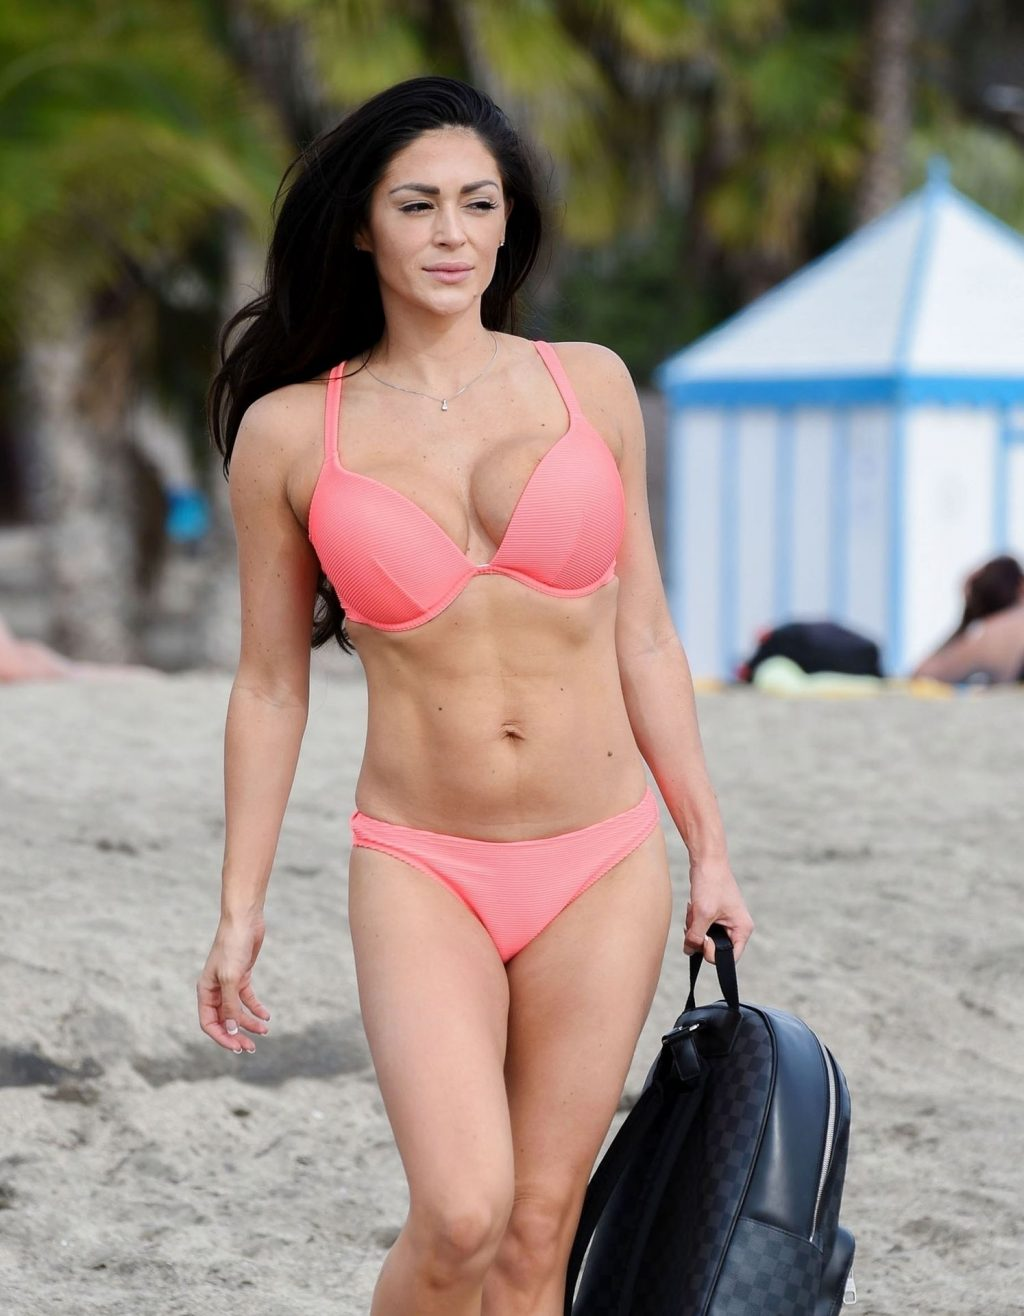 Andrea marin nude